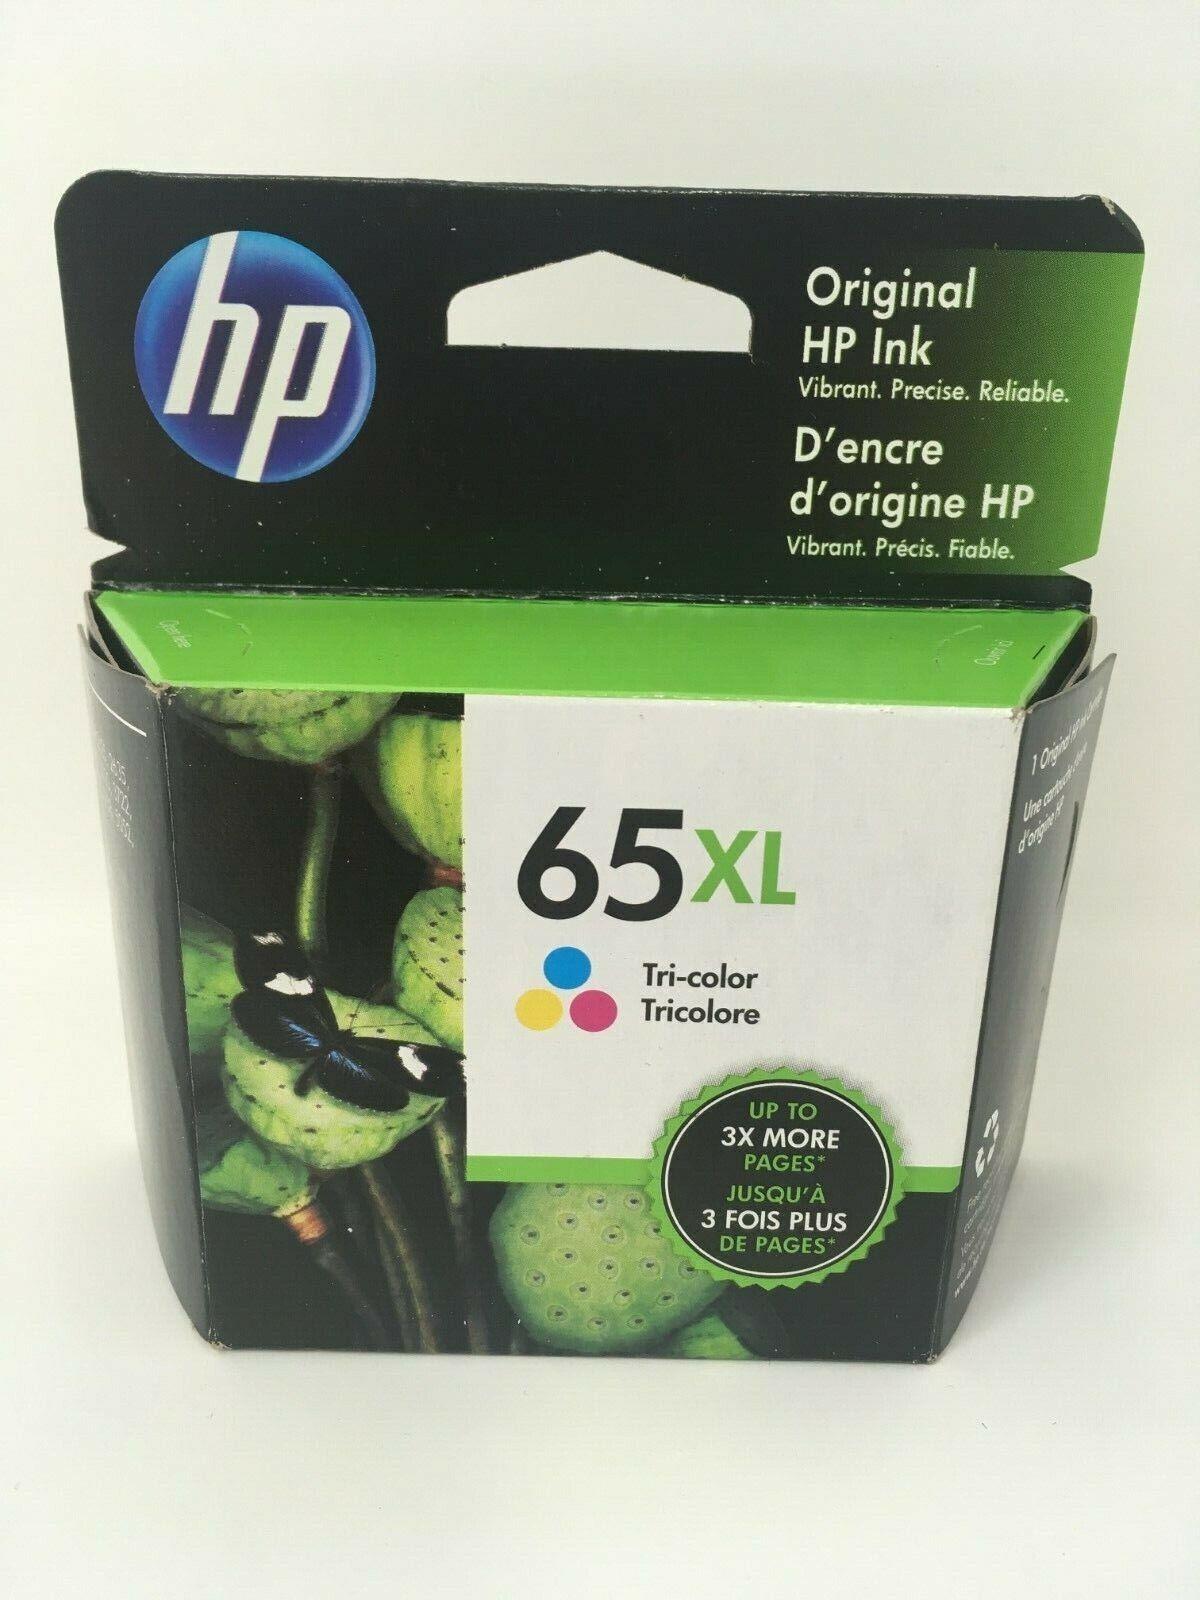 HP 65XL Original Ink Cartridge - Tri-color - Inkjet - High Y